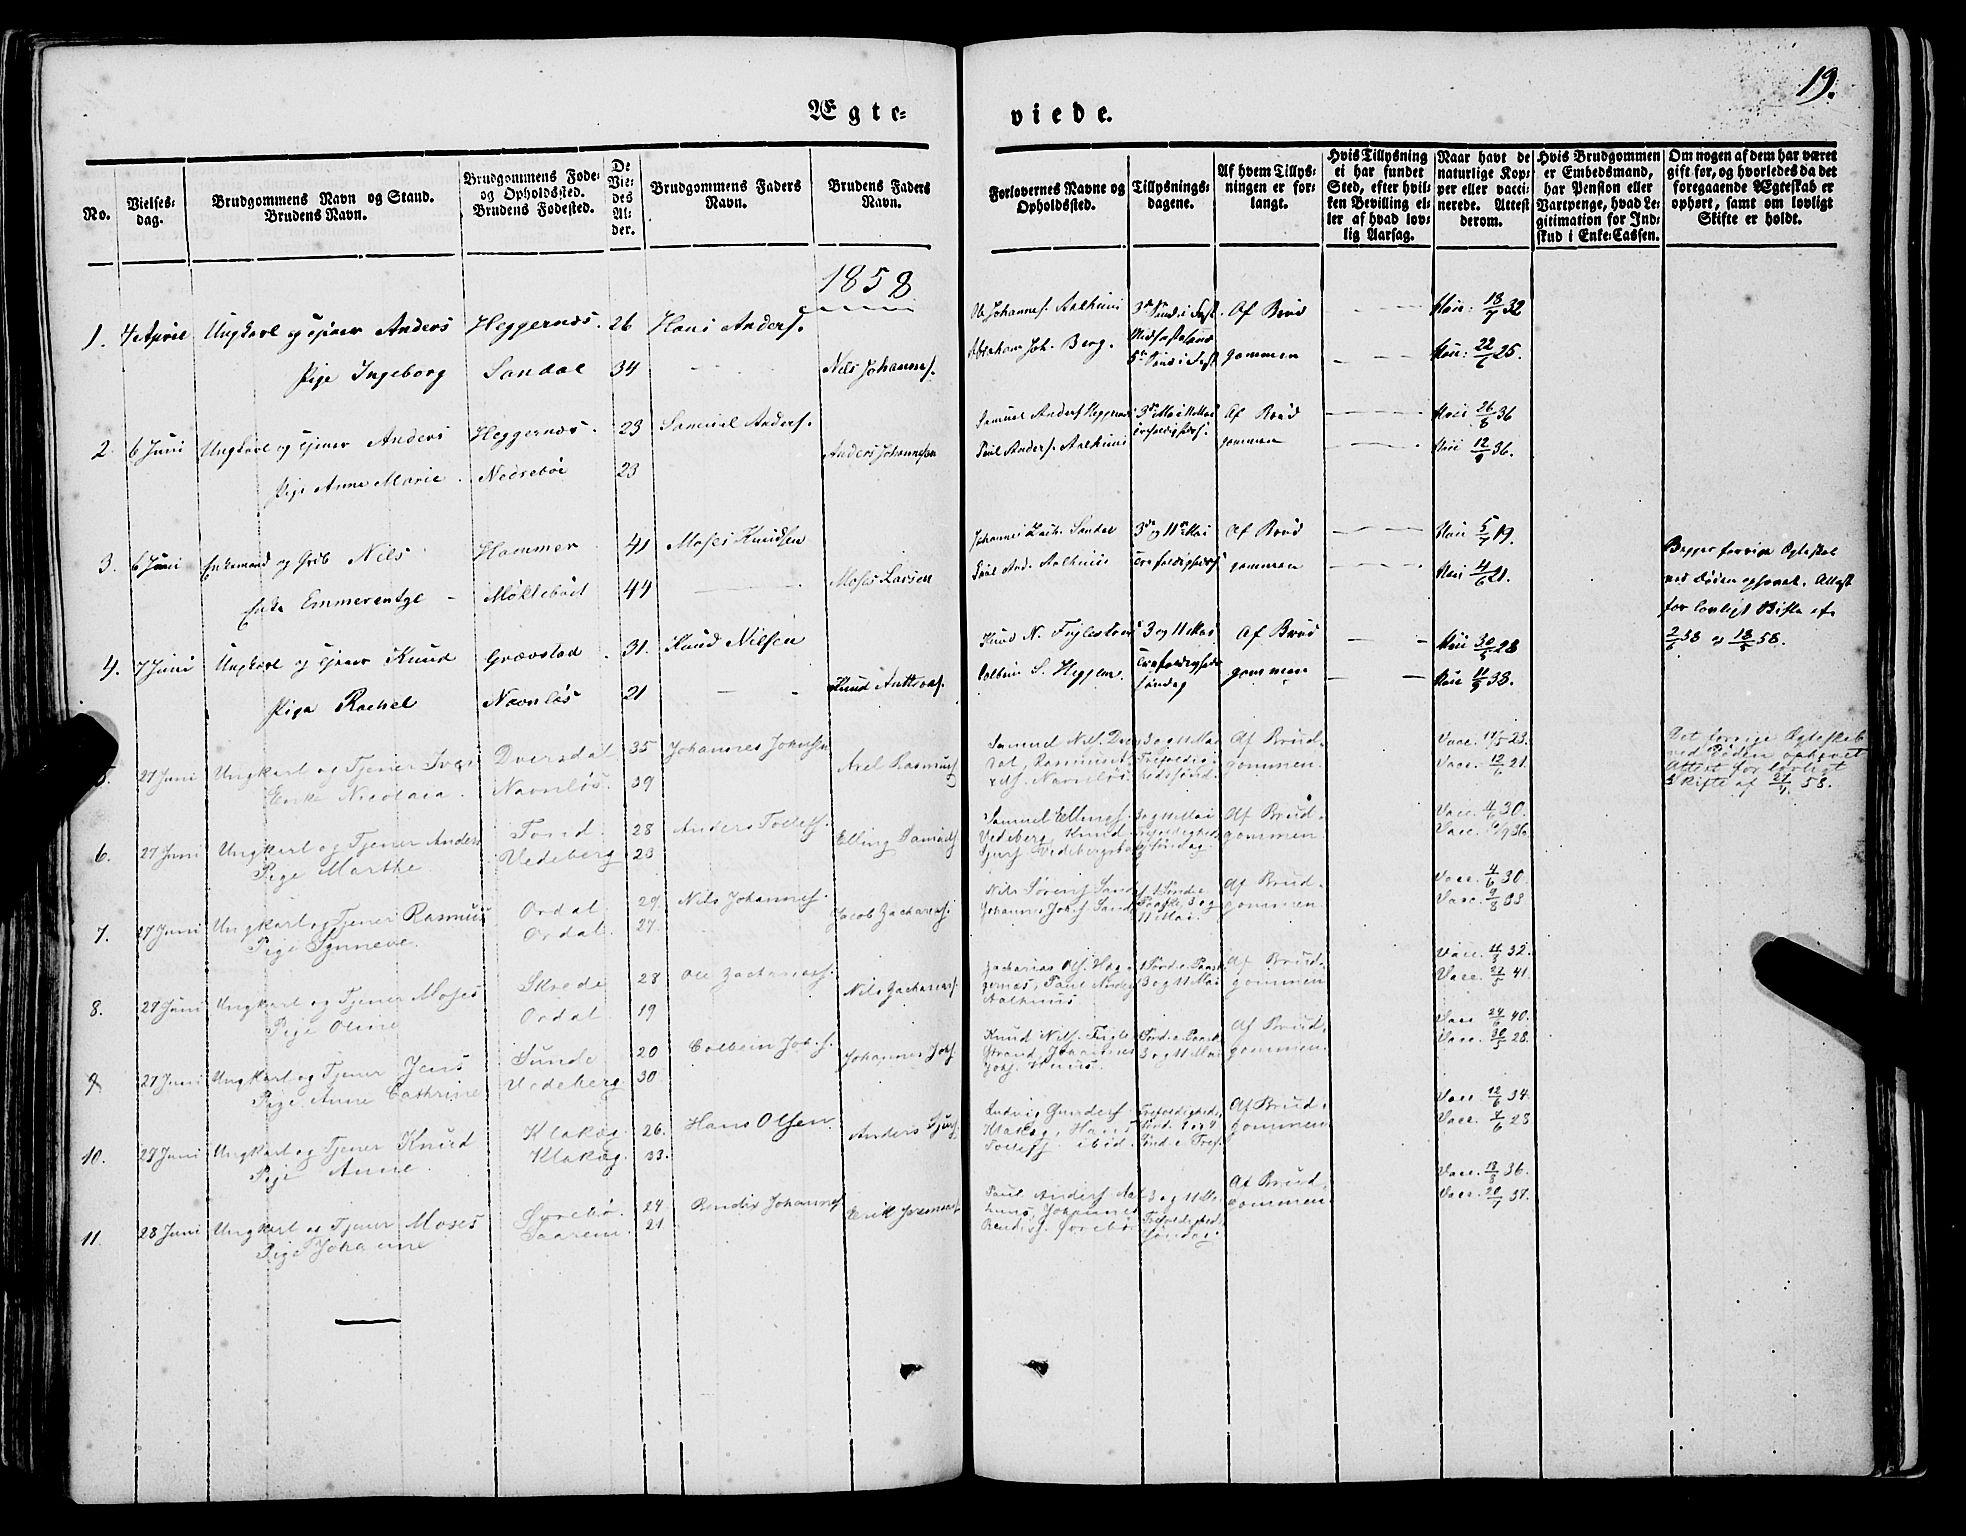 SAB, Jølster sokneprestembete, H/Haa/Haaa/L0010: Parish register (official) no. A 10, 1847-1865, p. 19